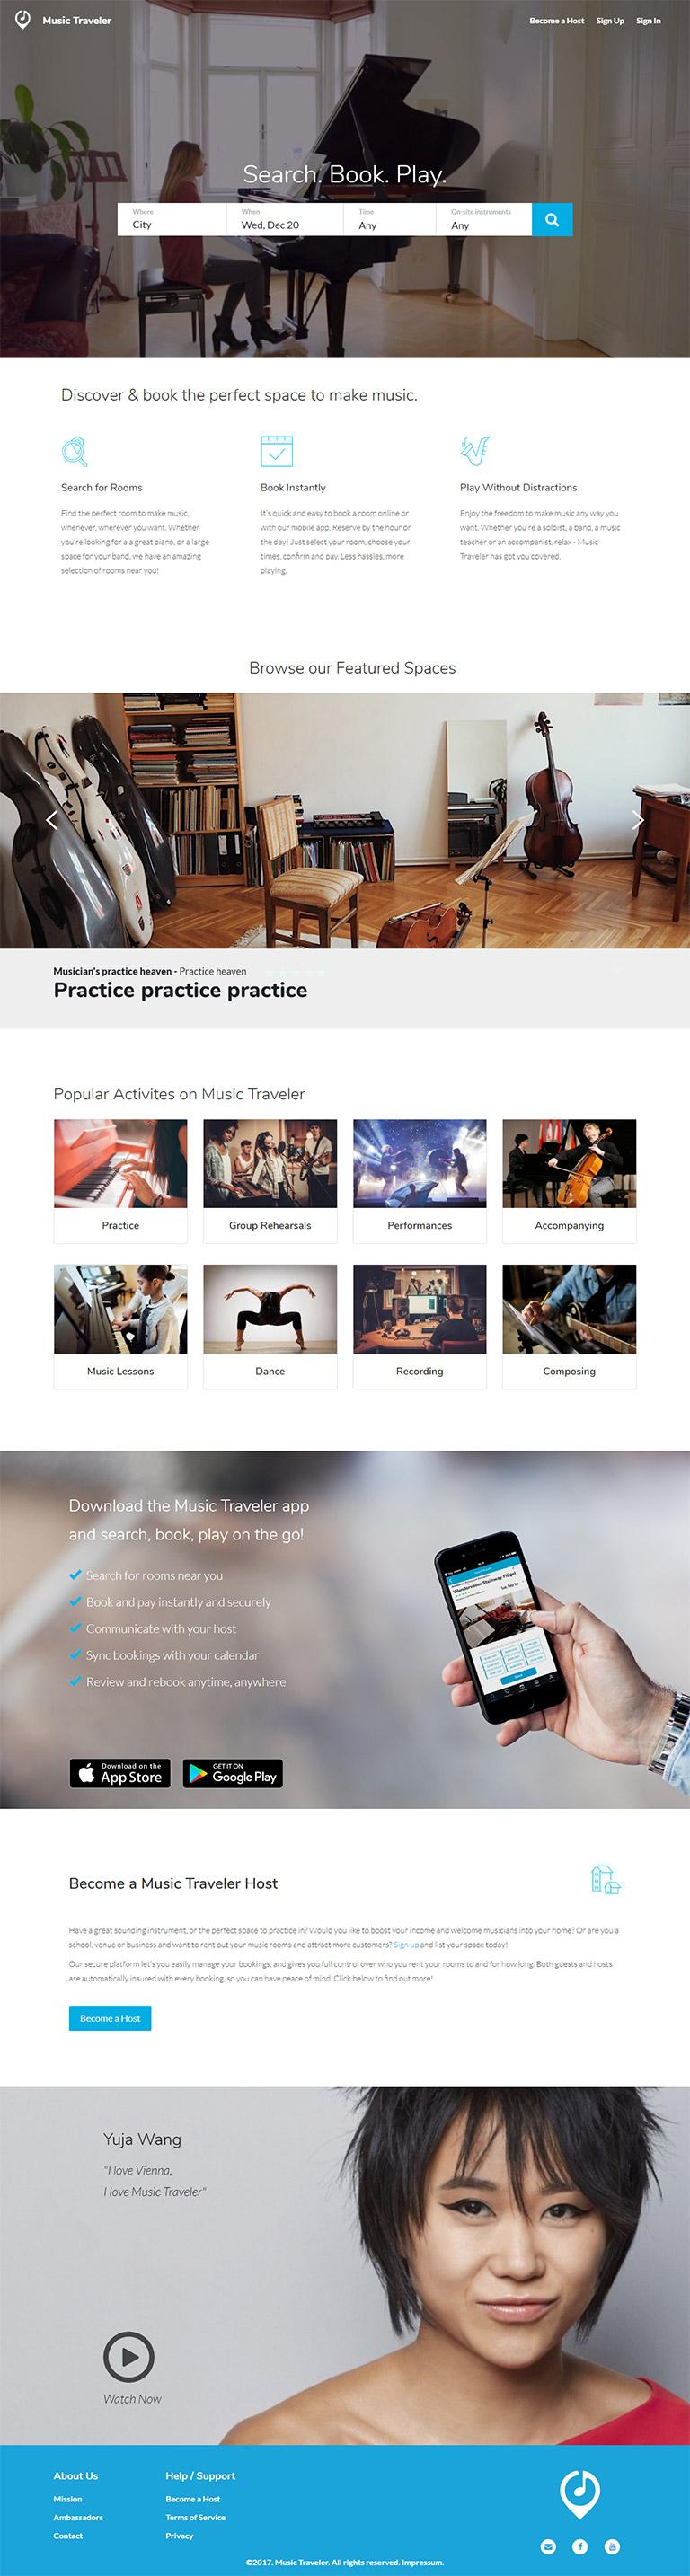 music studio app case study